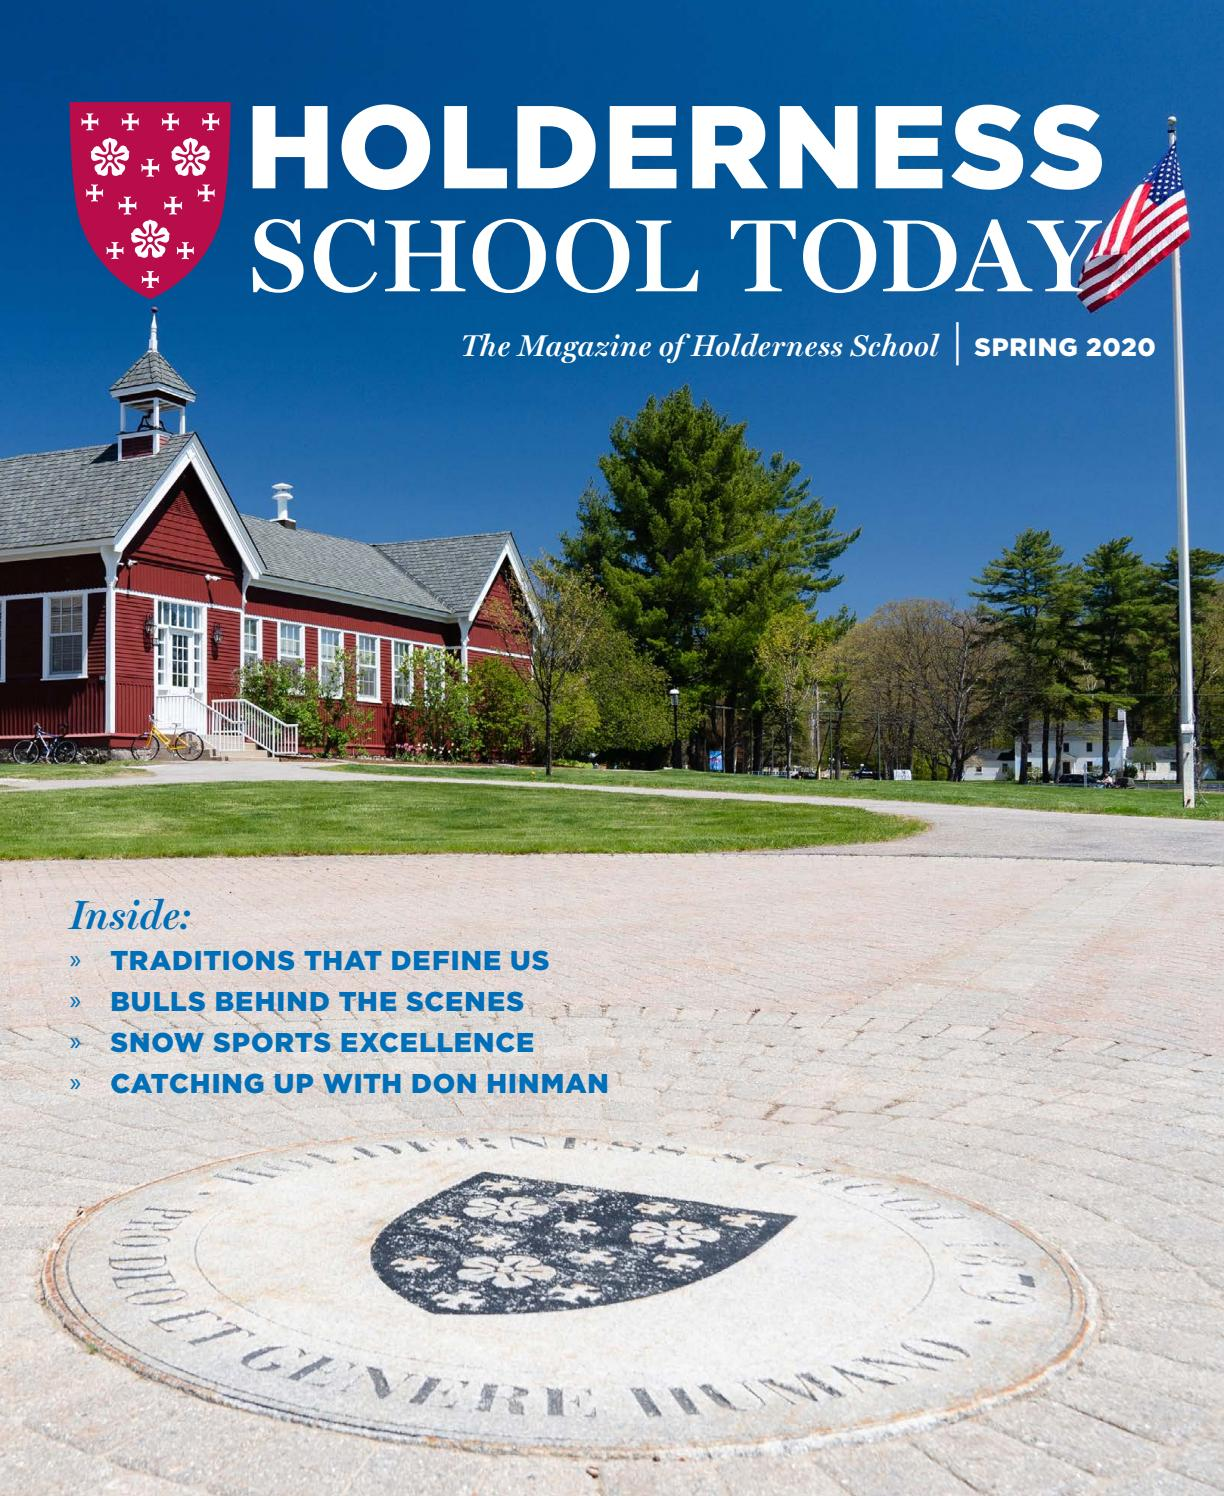 Ham Wentworth Schools Christmas Break 2020 Holderness School Today Spring 2020 by Holderness School   issuu